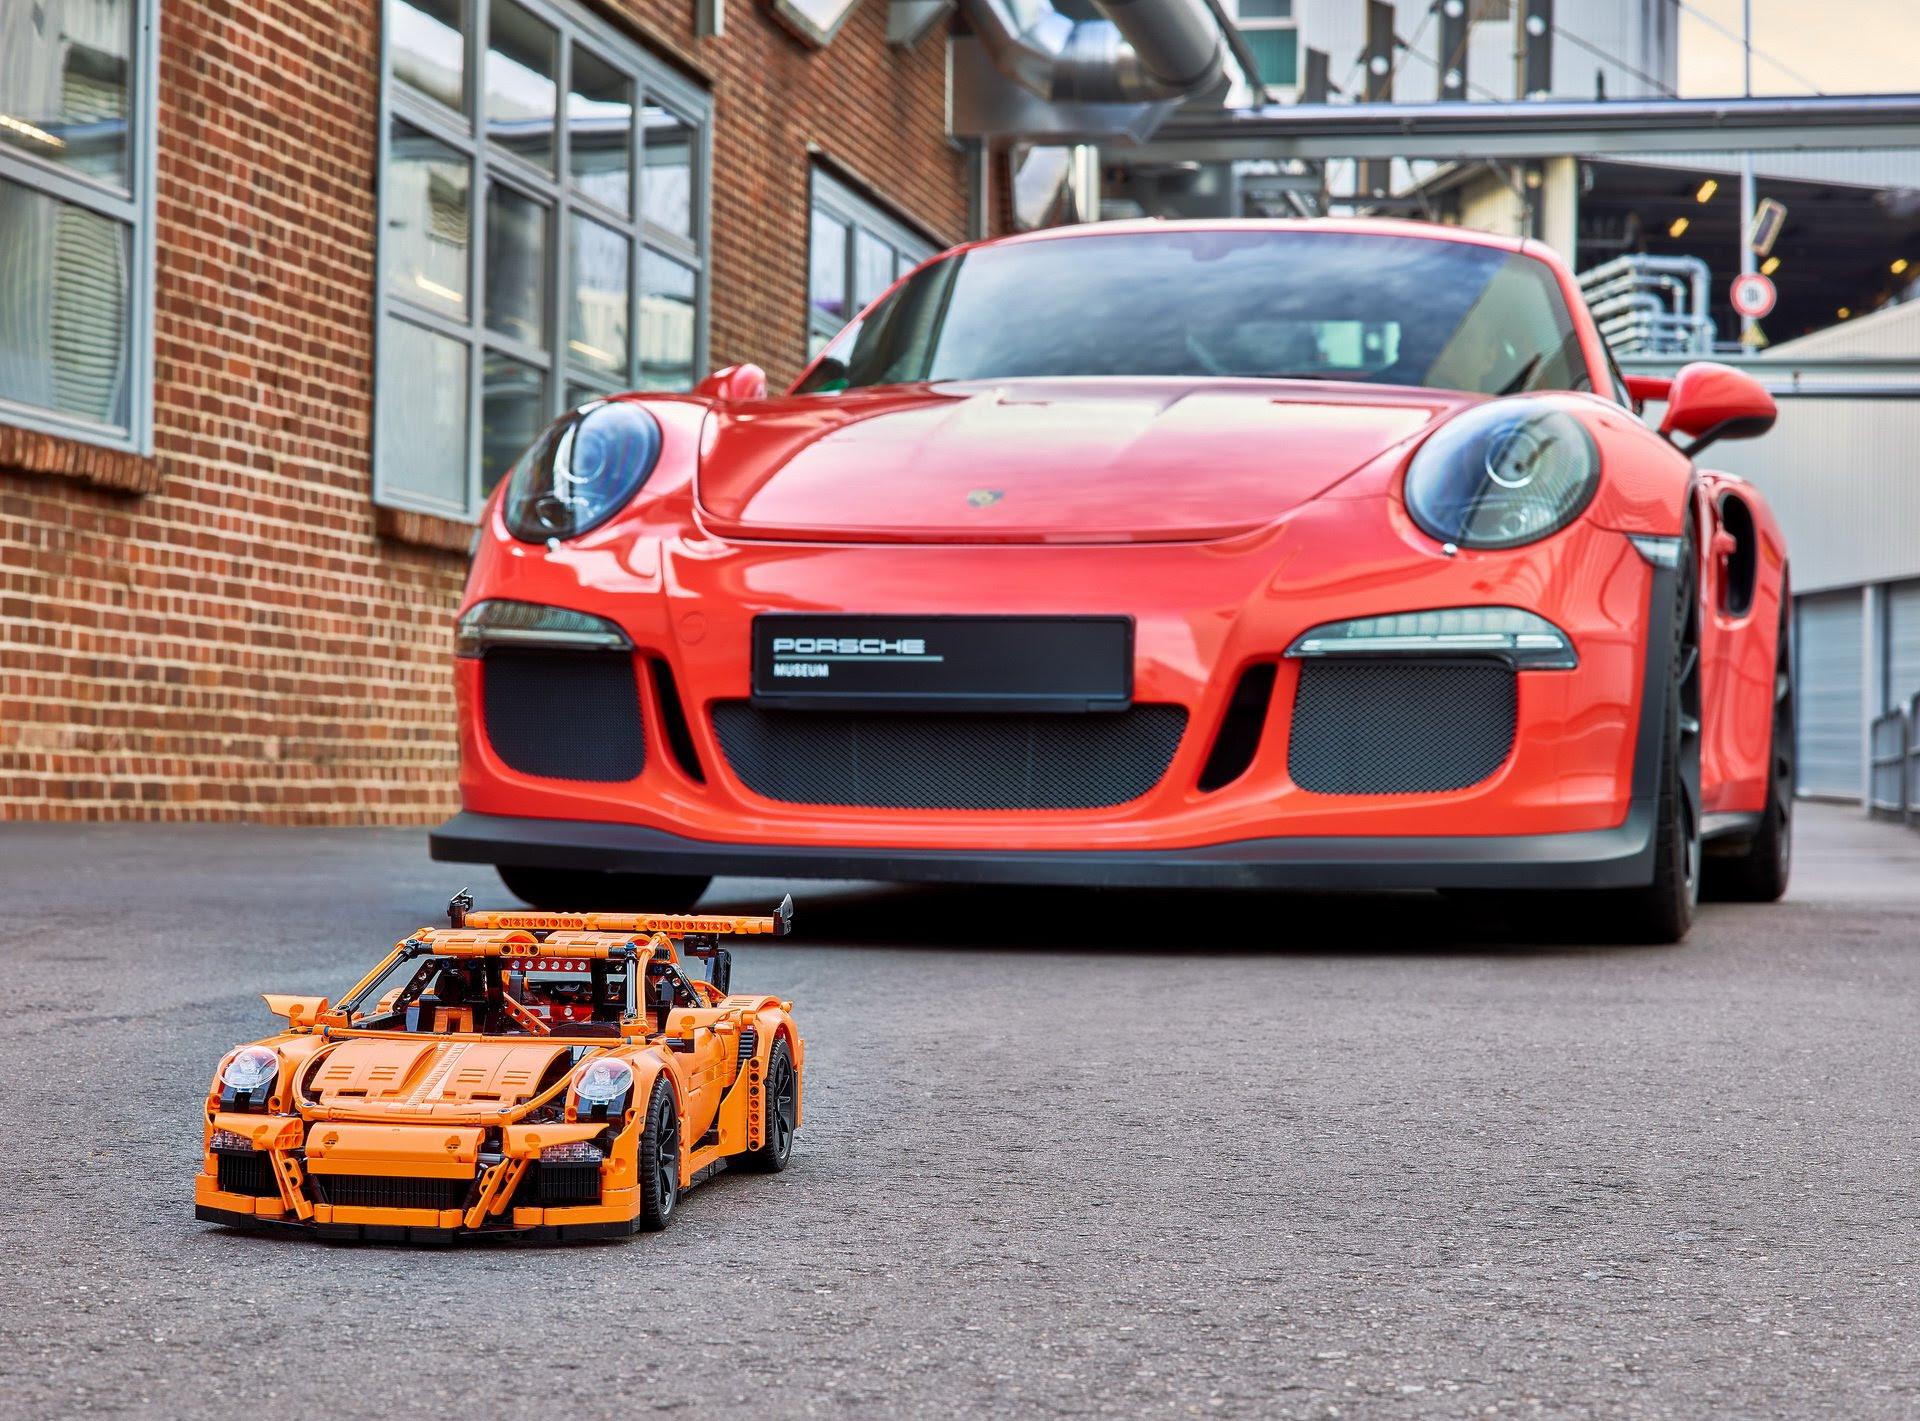 Final Lego Technic Porsche 911 Gt3 Rs Scale Model Rolls Off